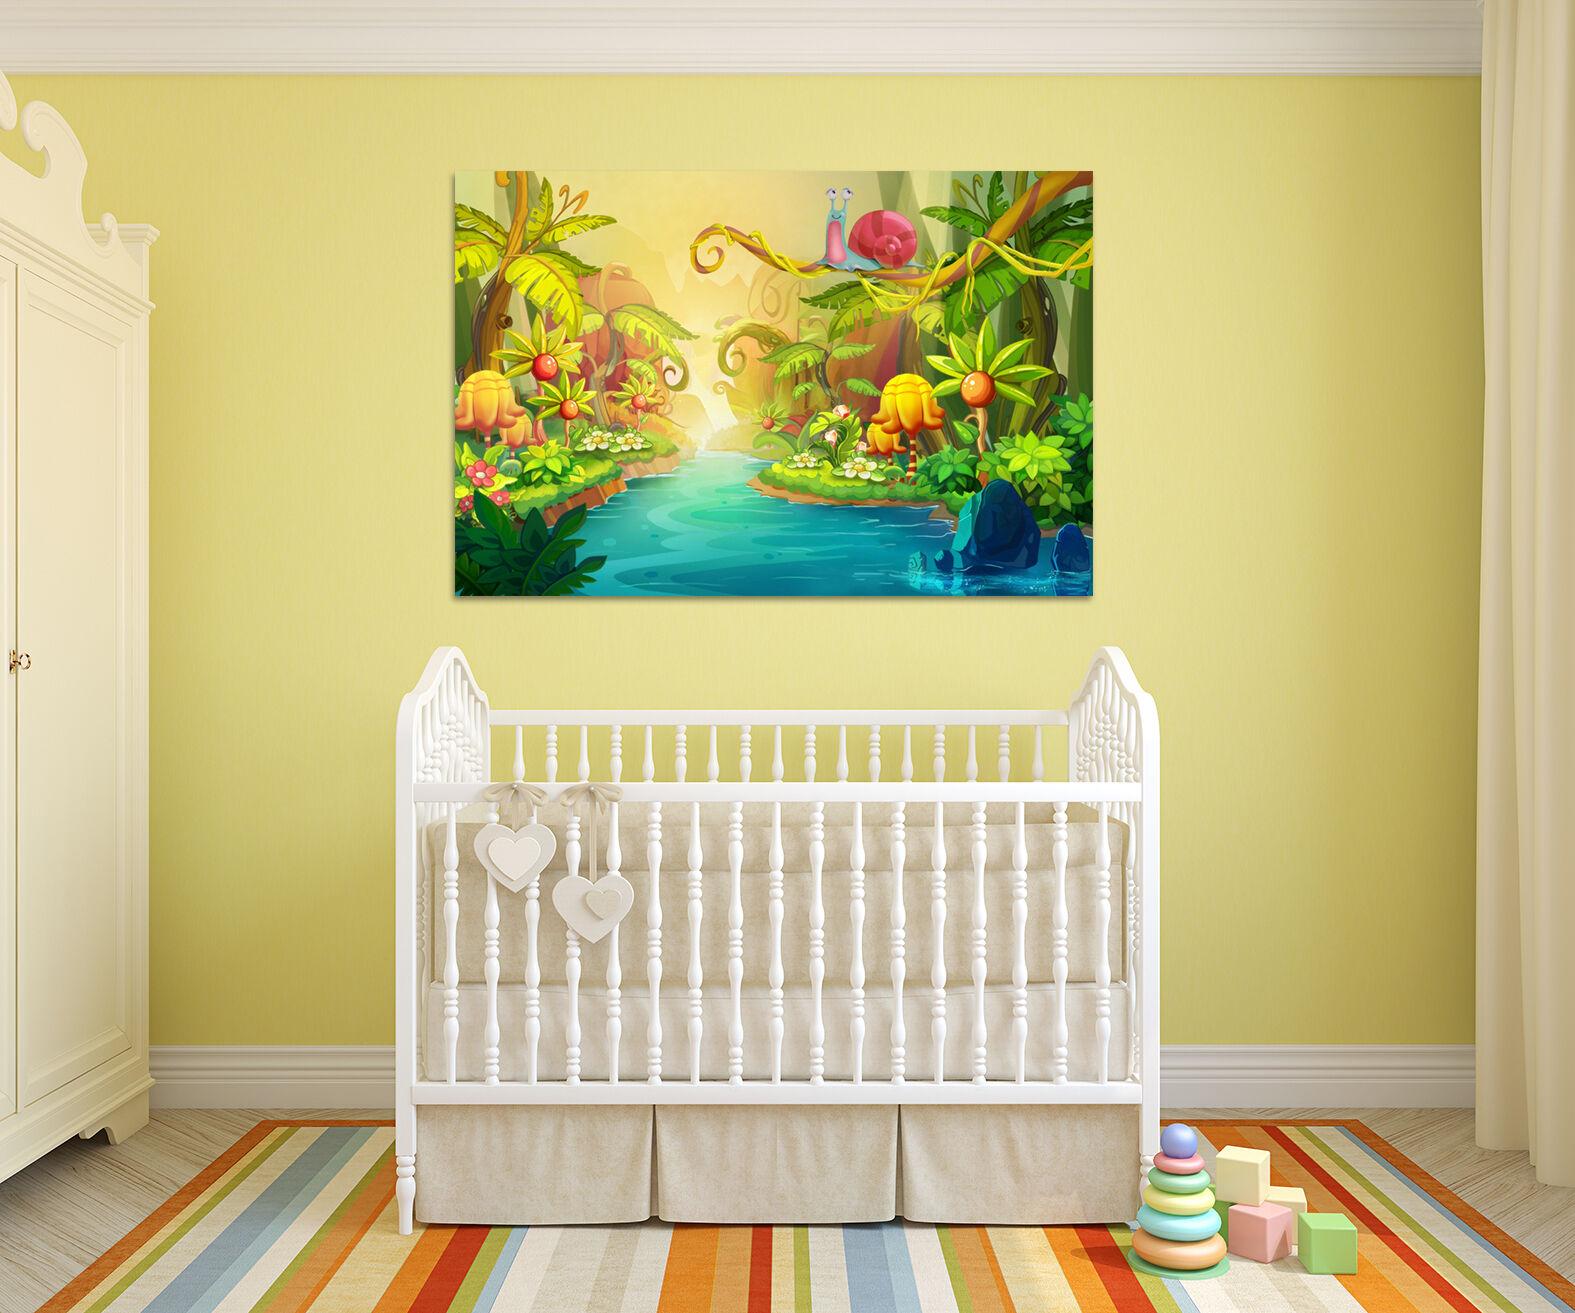 3D Mrchenlandschaft 533 Fototapeten Wandbild BildTapete Familie AJSTORE DE